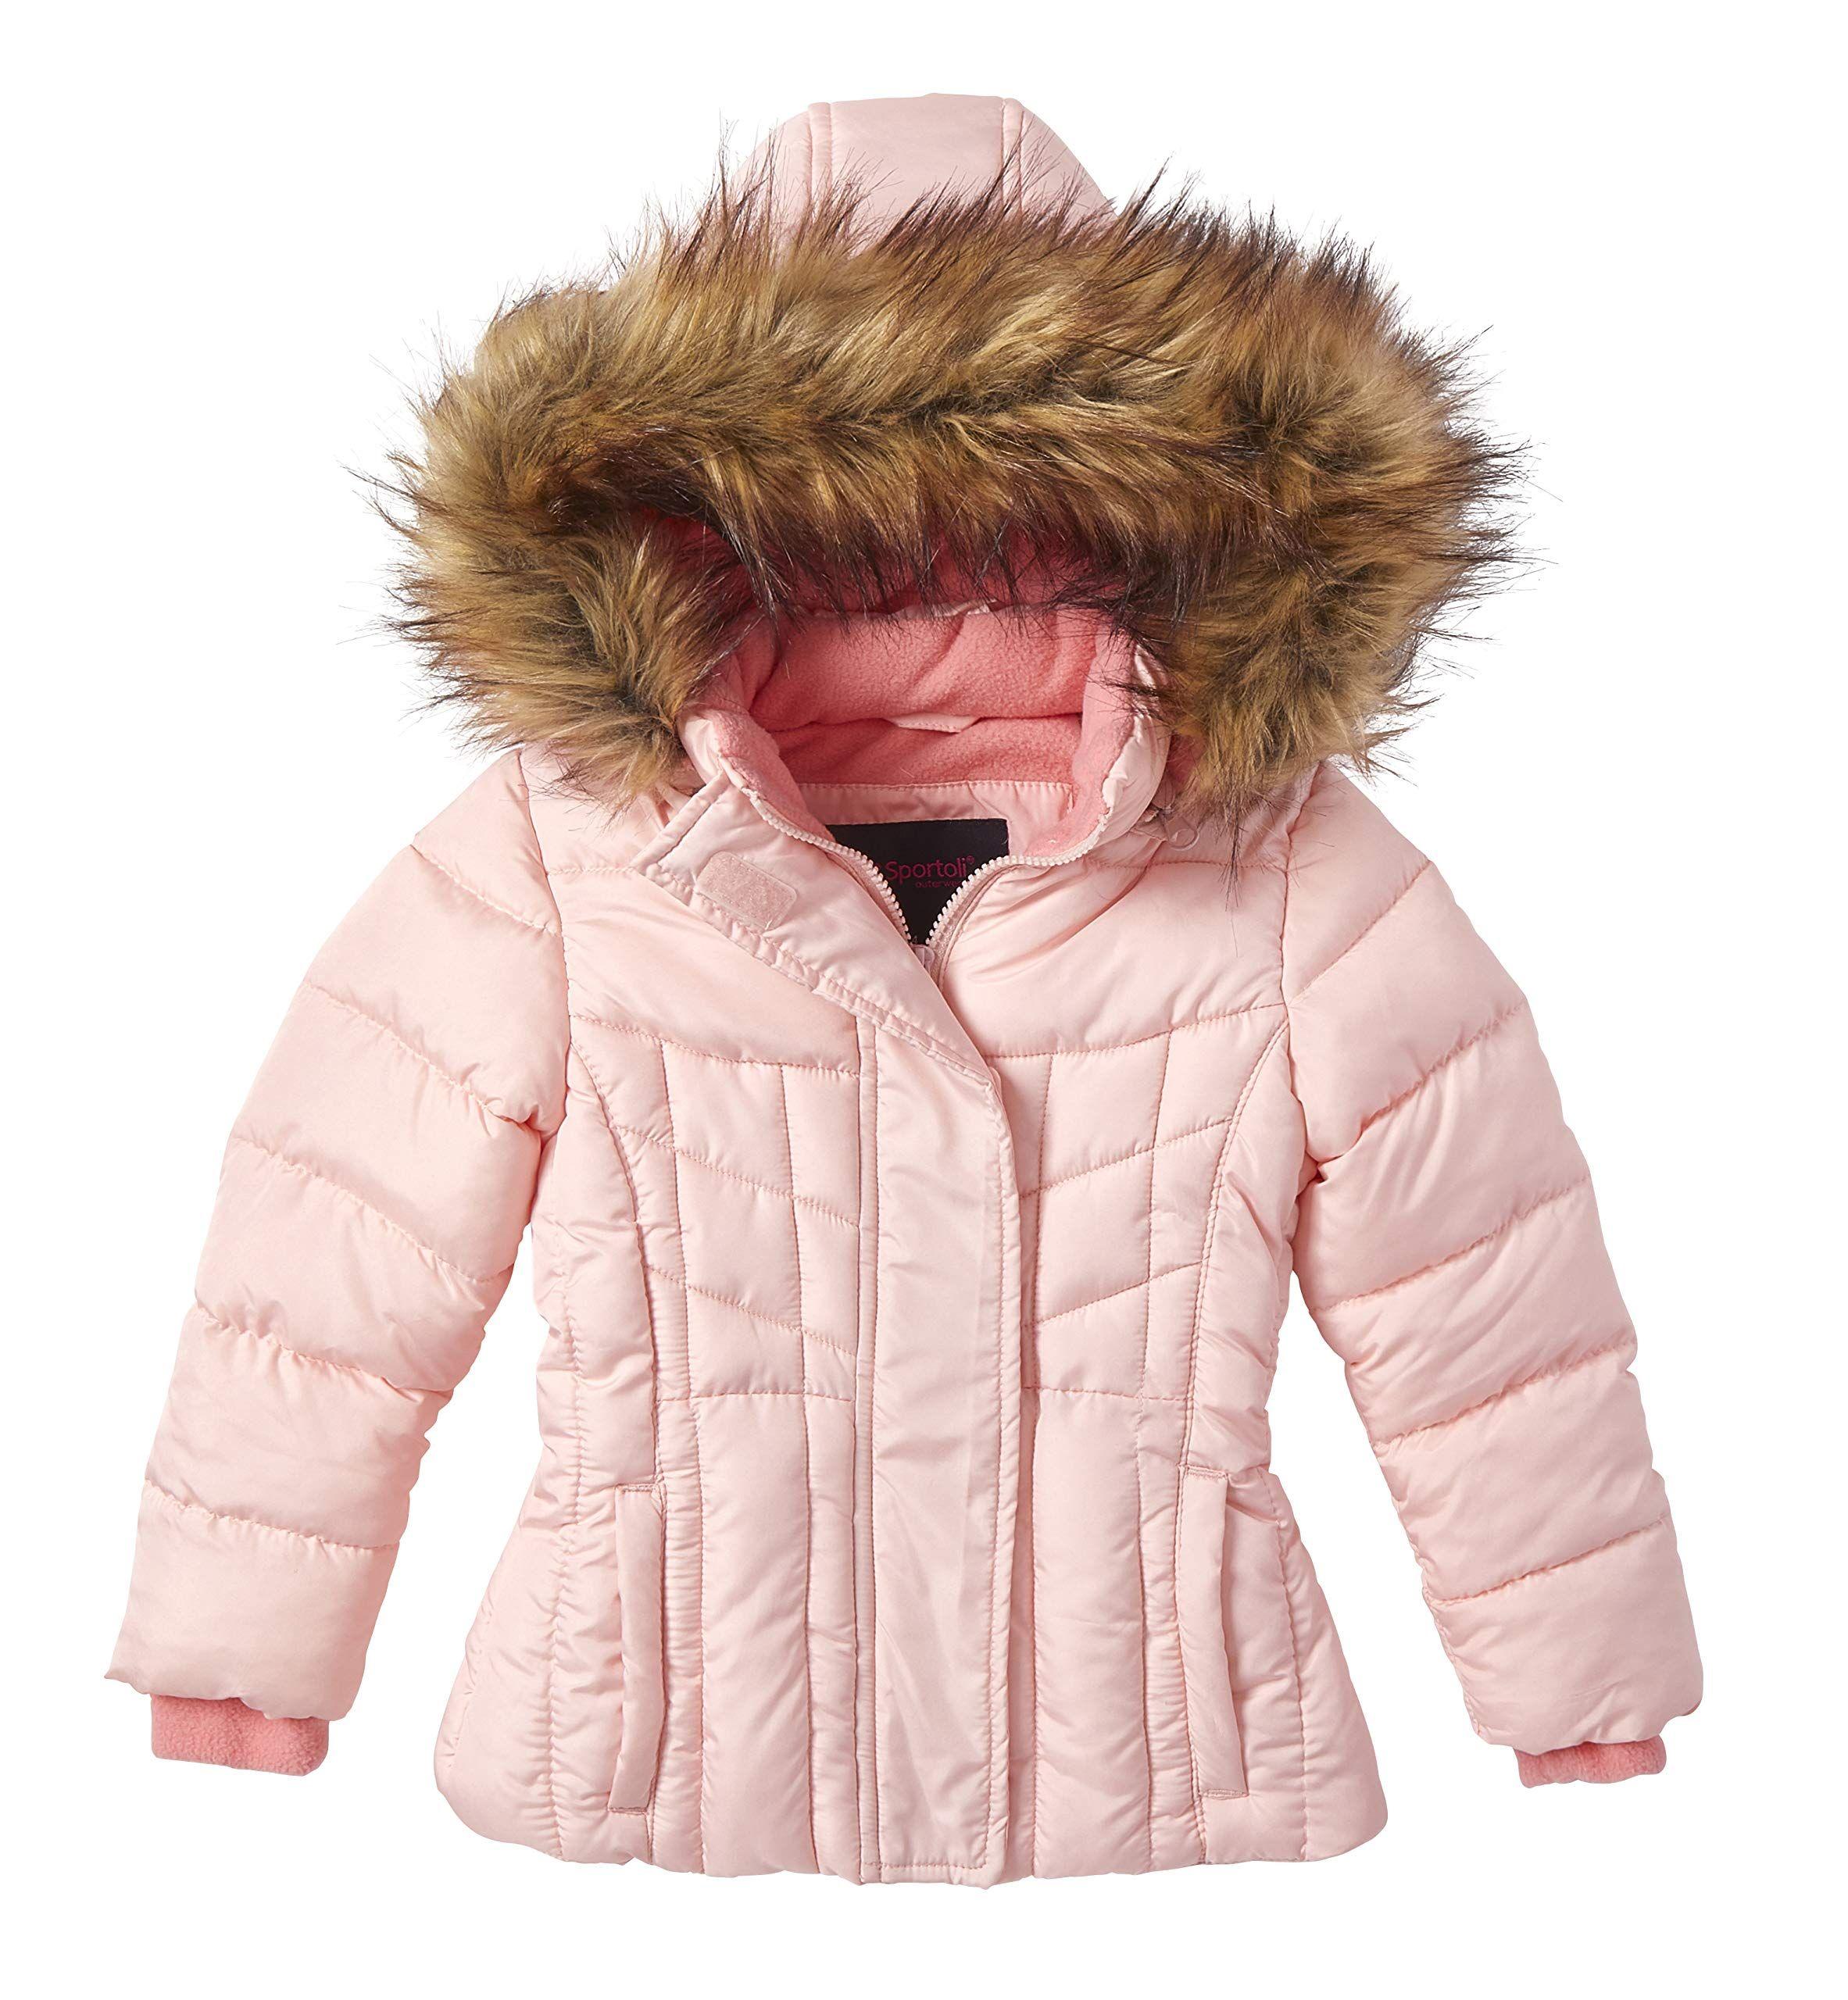 Girls Quilted Fleece Lined Winter Puffer Jacket Coat Faux Fur Trim Zip Off Hood Ad Lined Winter Puffer Gir Winter Puffer Jackets Girls Quilts Fur Trim [ 2560 x 2365 Pixel ]